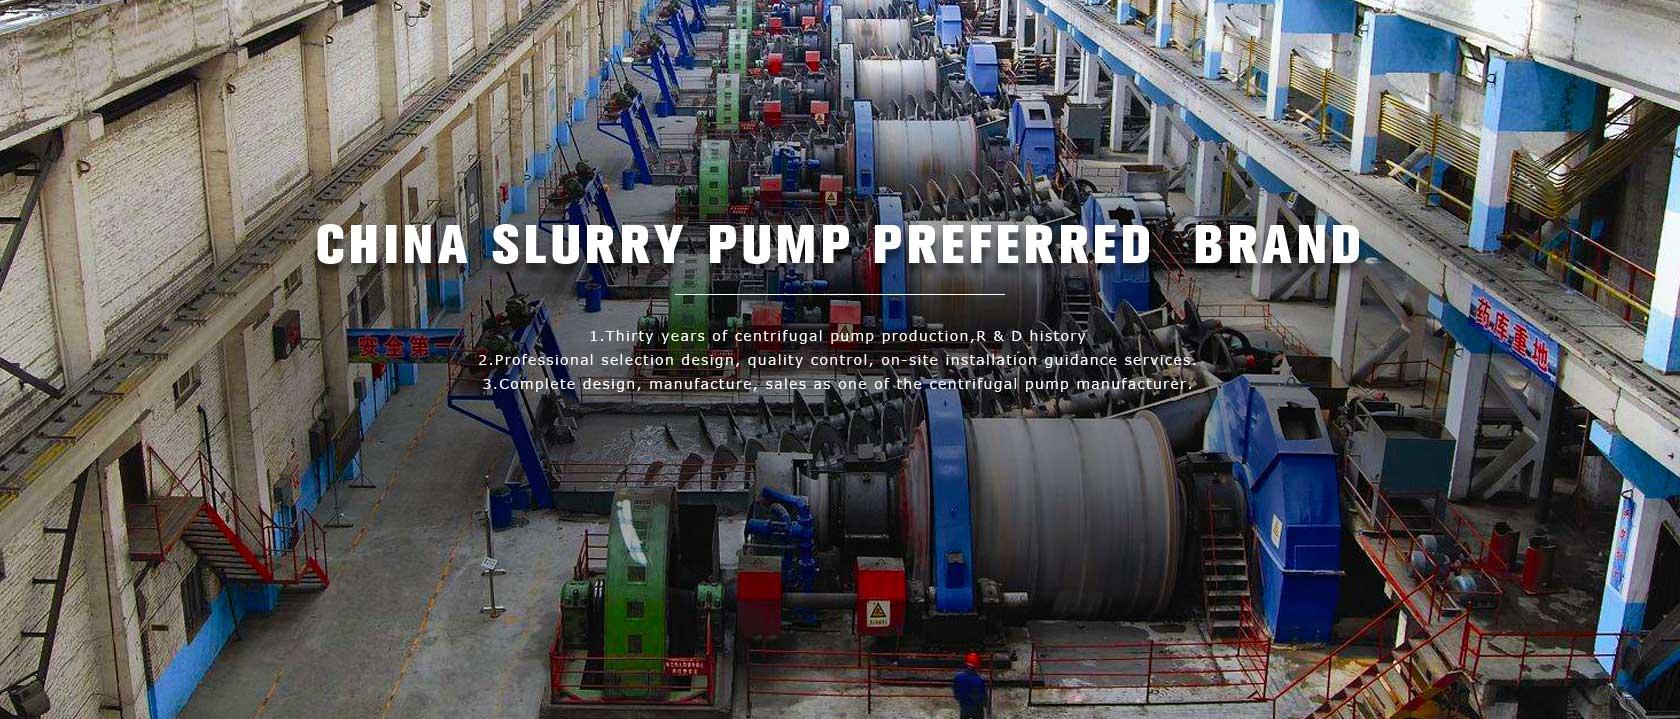 China Slurry Pump Preferred Brand